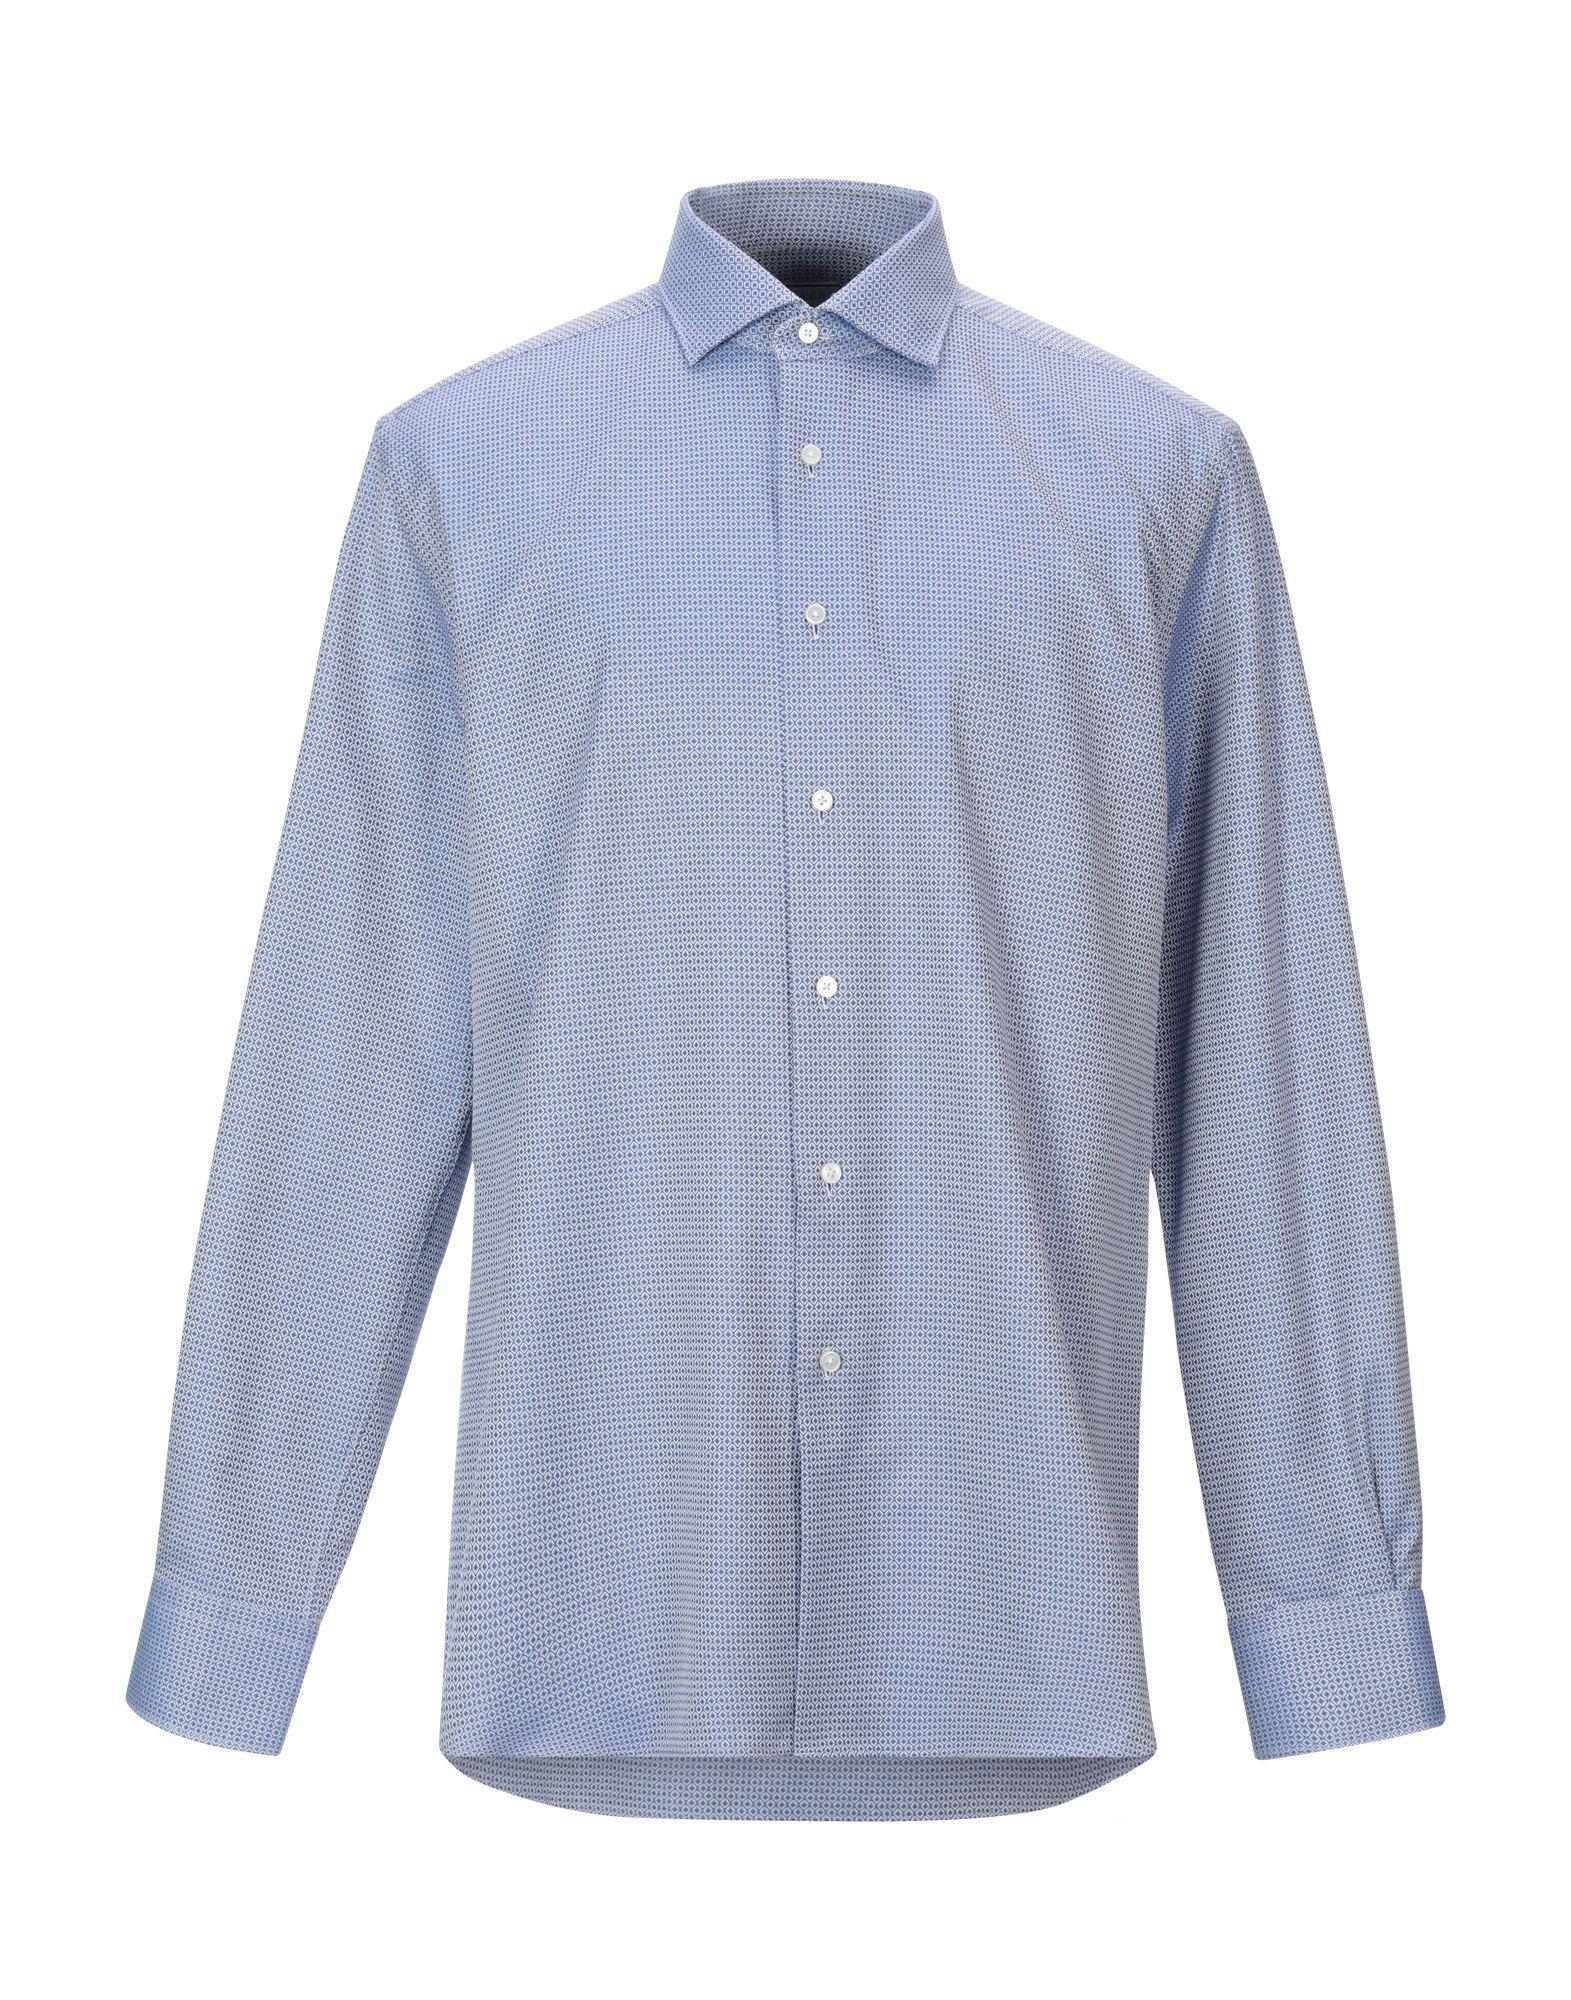 d067f813bcac Lyst - Xacus Shirt in Blue for Men